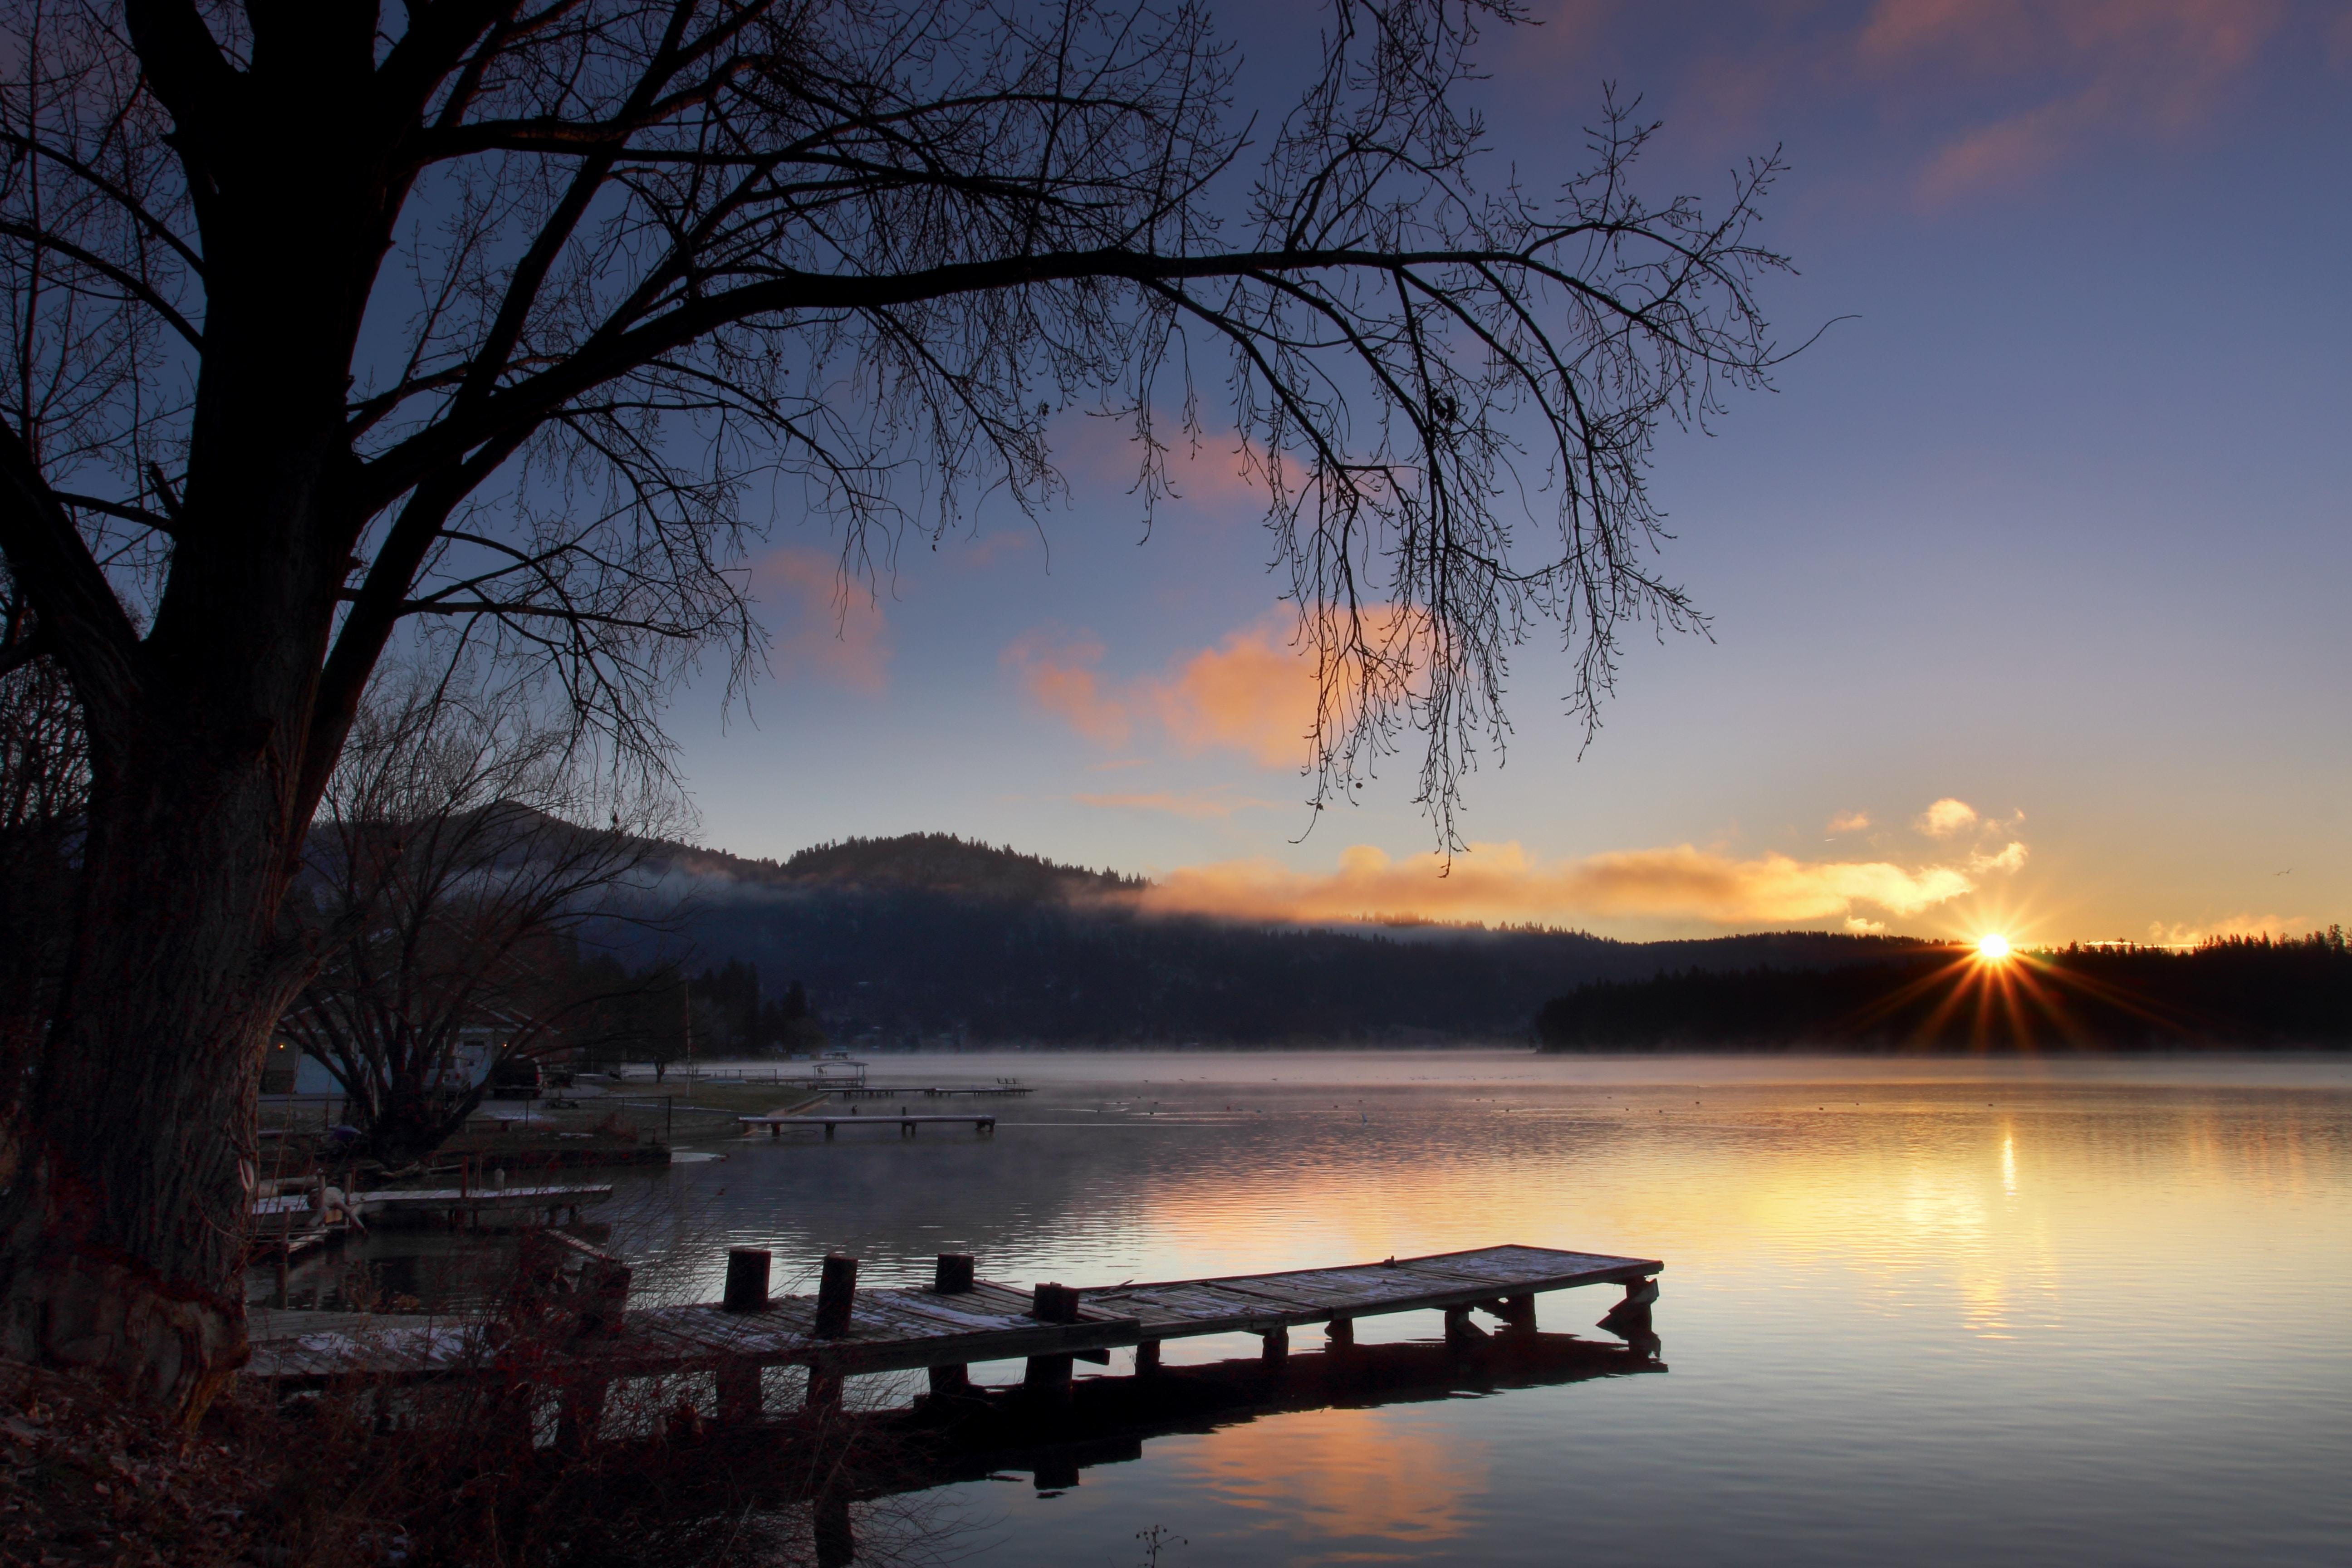 dock near tree during golden hour